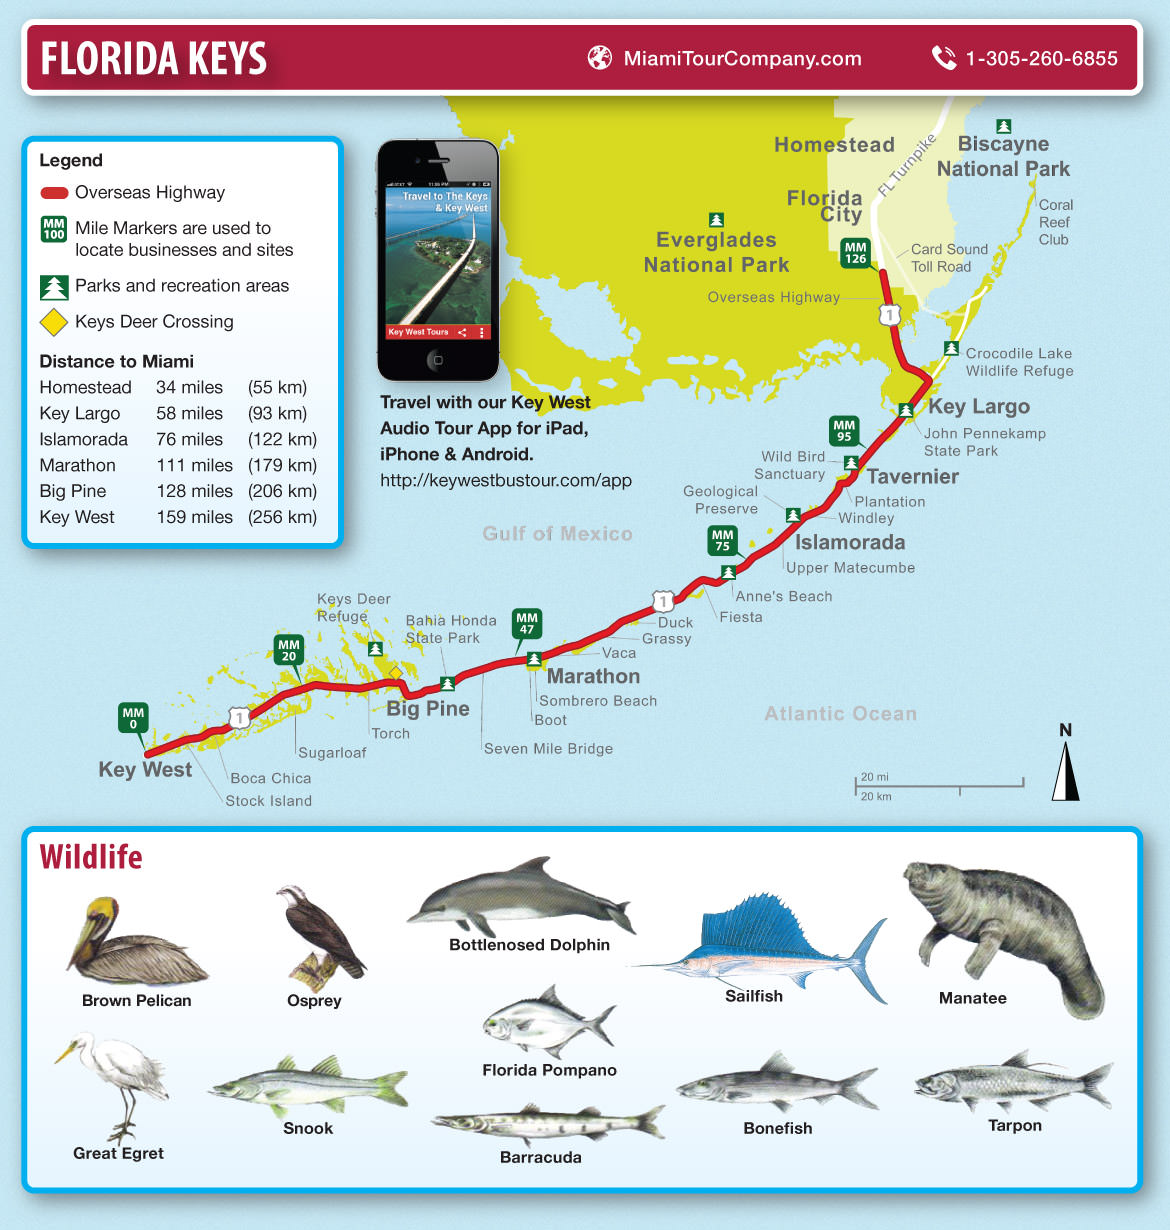 Mappa delle Florida Keys